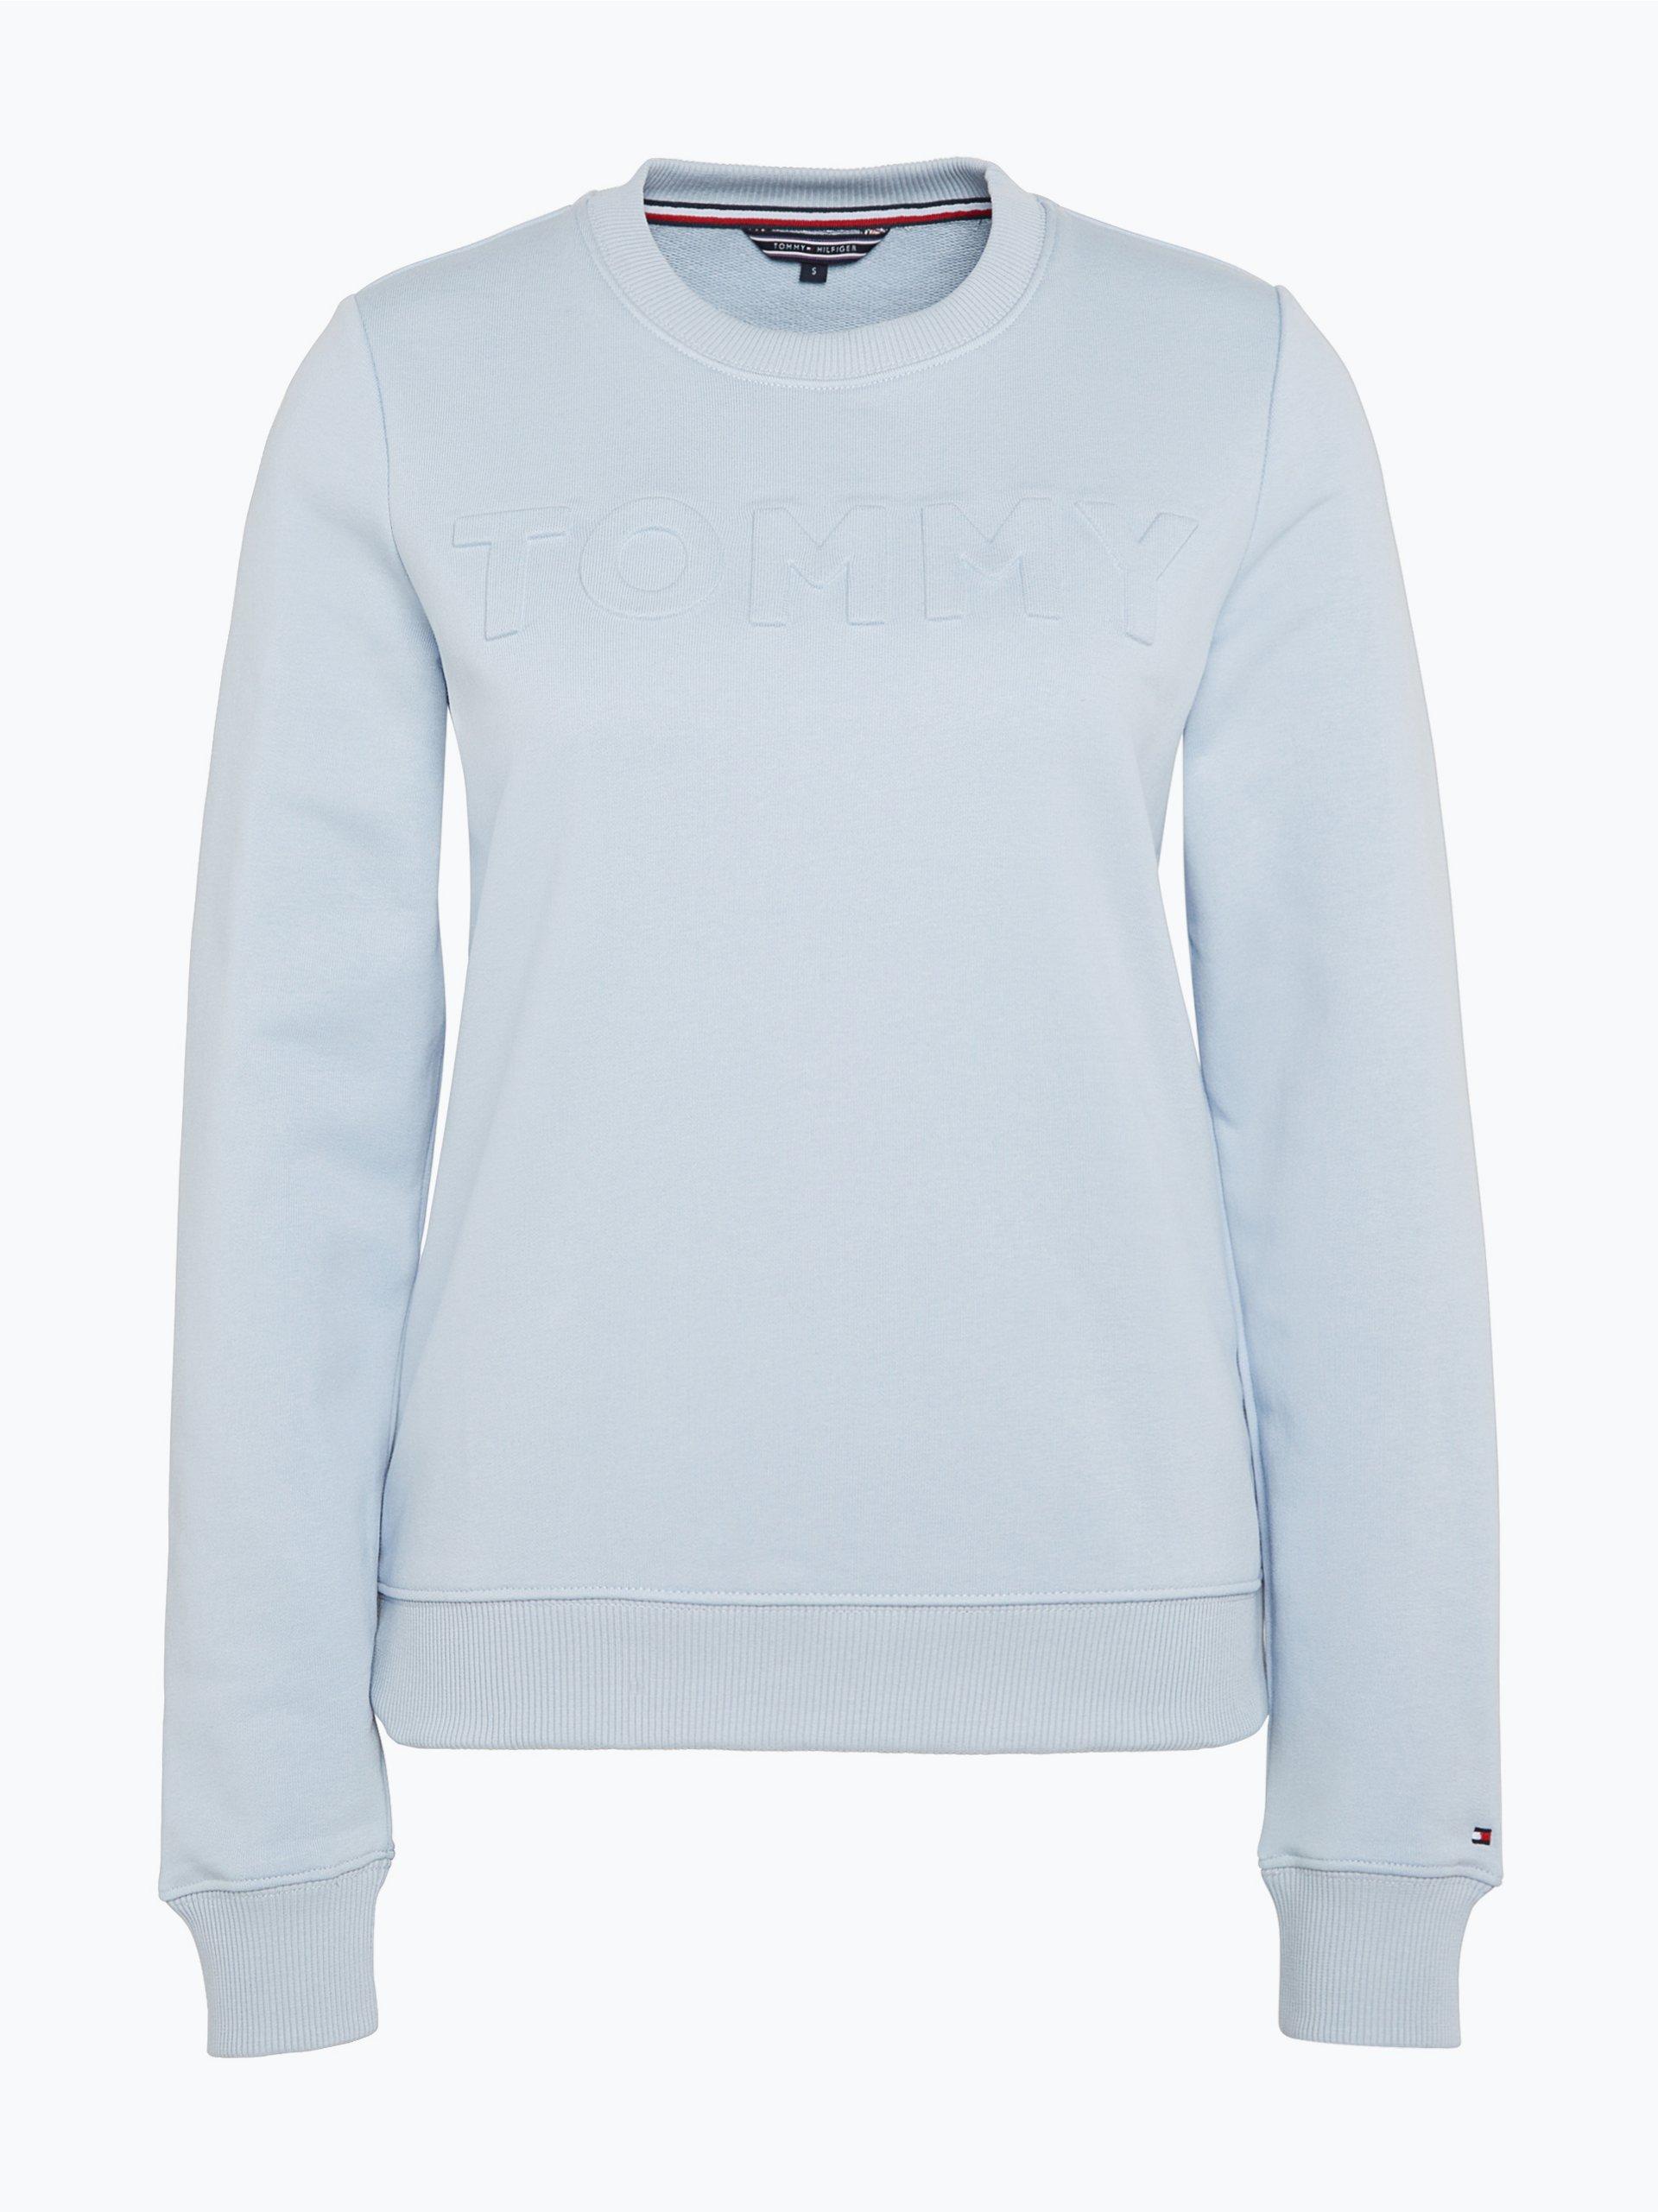 tommy hilfiger damen sweatshirt hellblau gemustert online. Black Bedroom Furniture Sets. Home Design Ideas